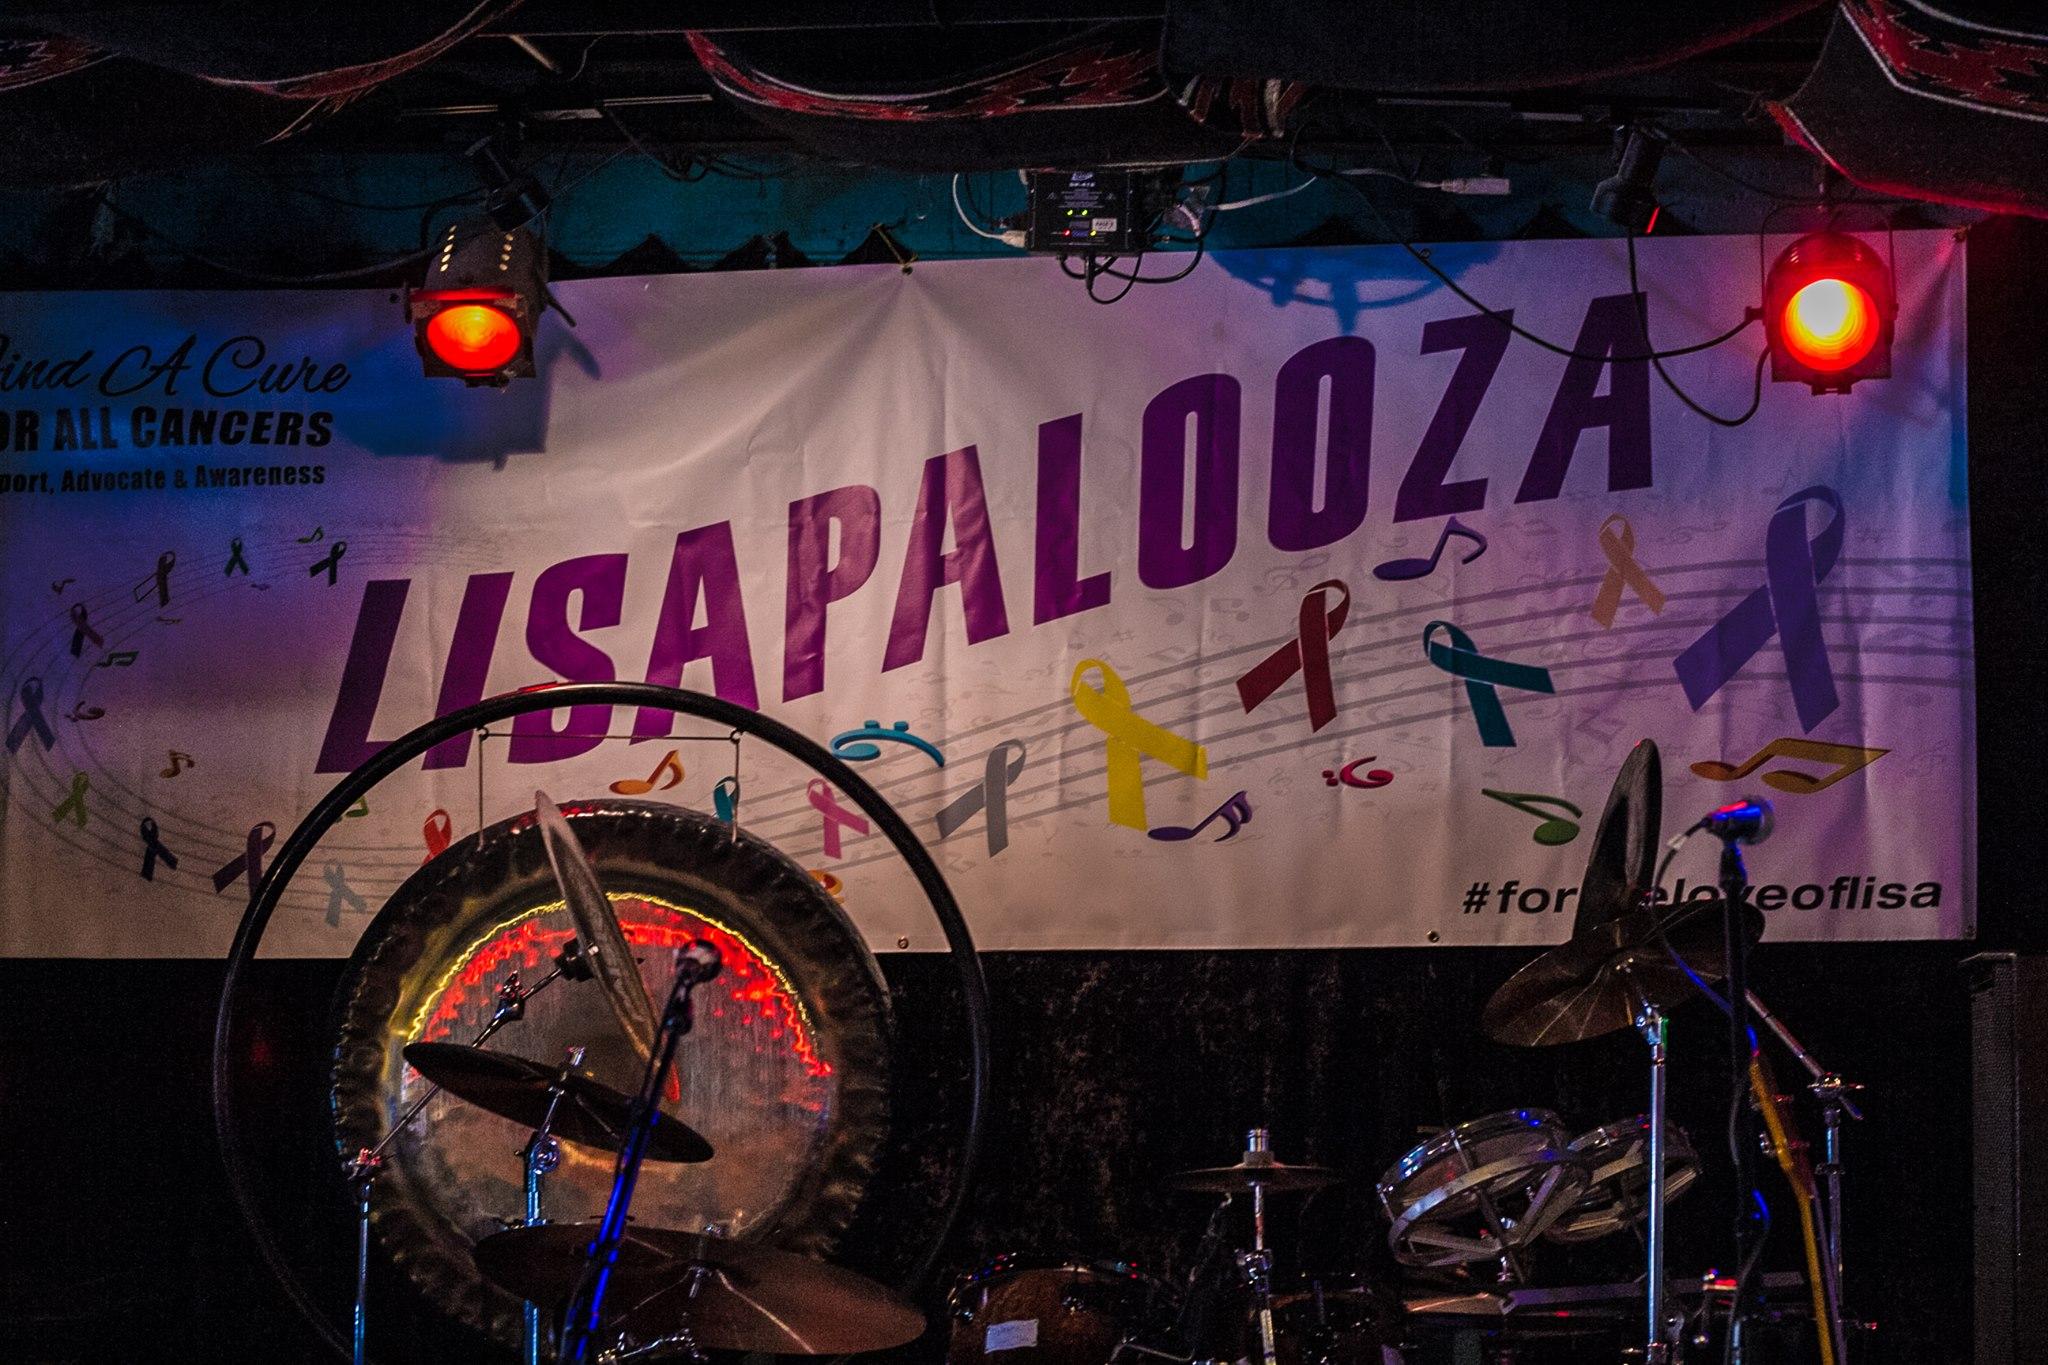 Lisapalooza banner